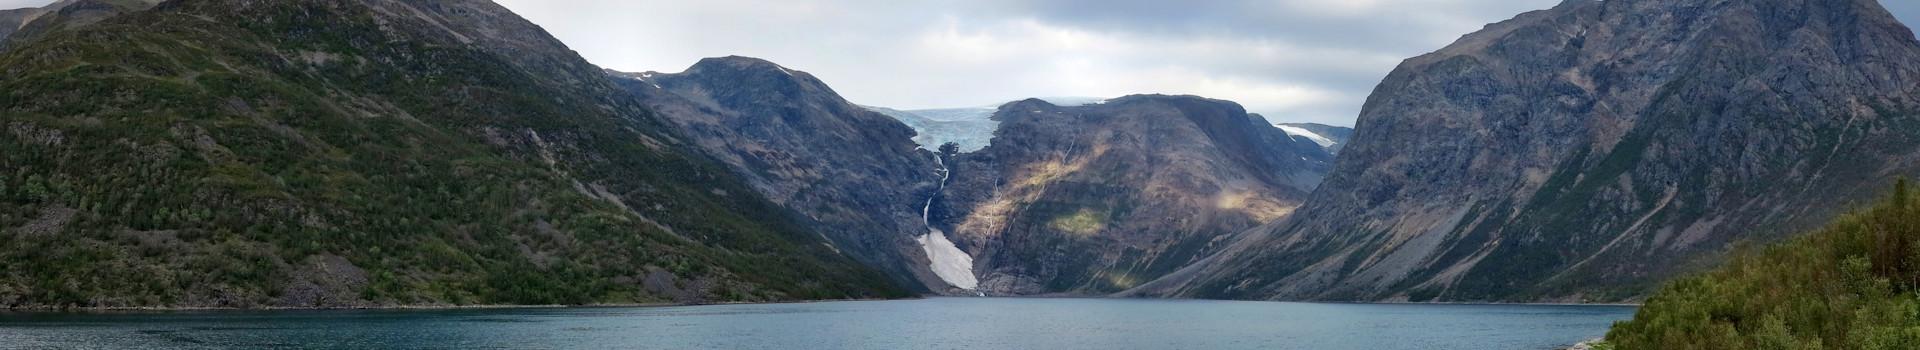 Jøkelfjord-Gletscher